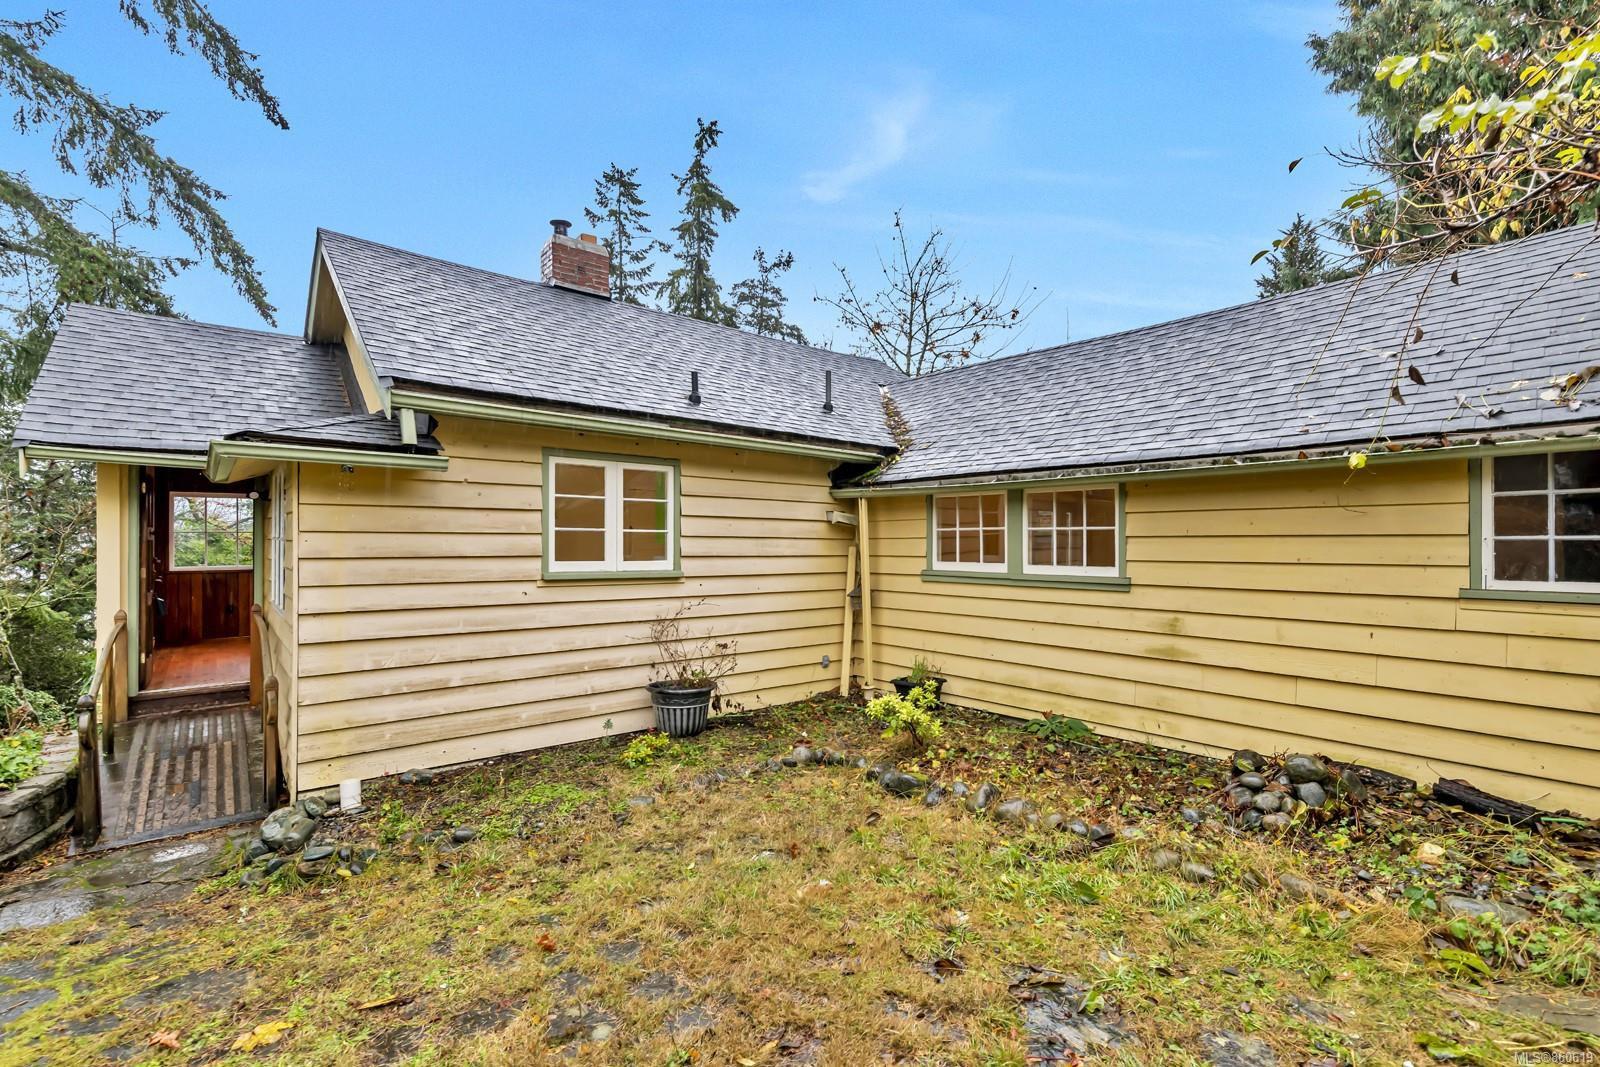 Main Photo: 6726 Drummond Dr in : Du East Duncan House for sale (Duncan)  : MLS®# 860619